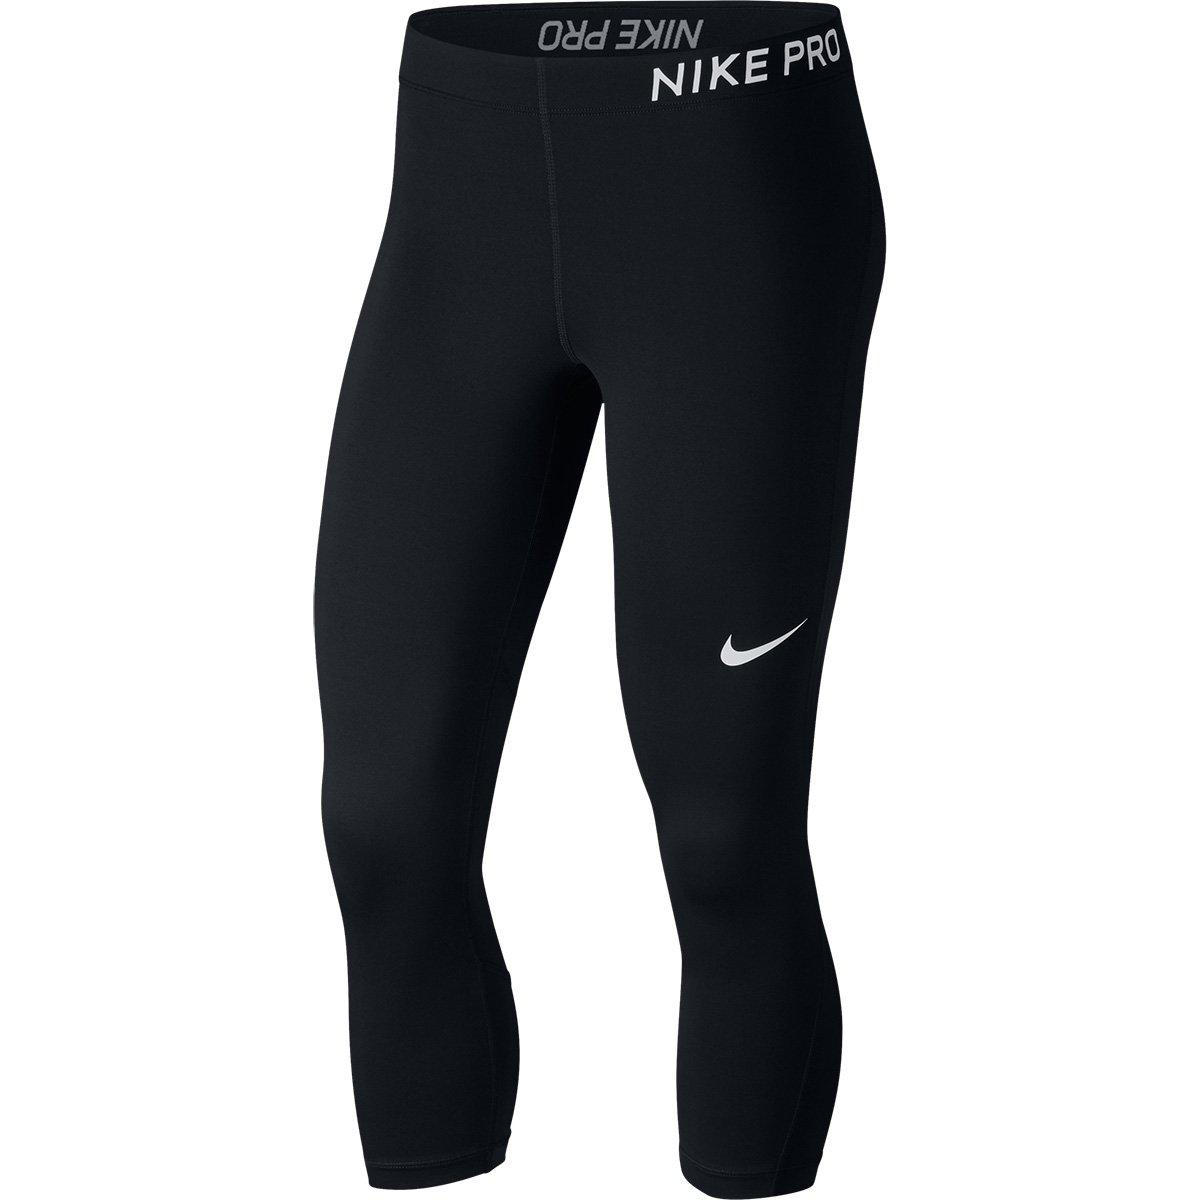 Calça Calça Feminina Capri Capri Preto e Nike Pro Branco q1RXw